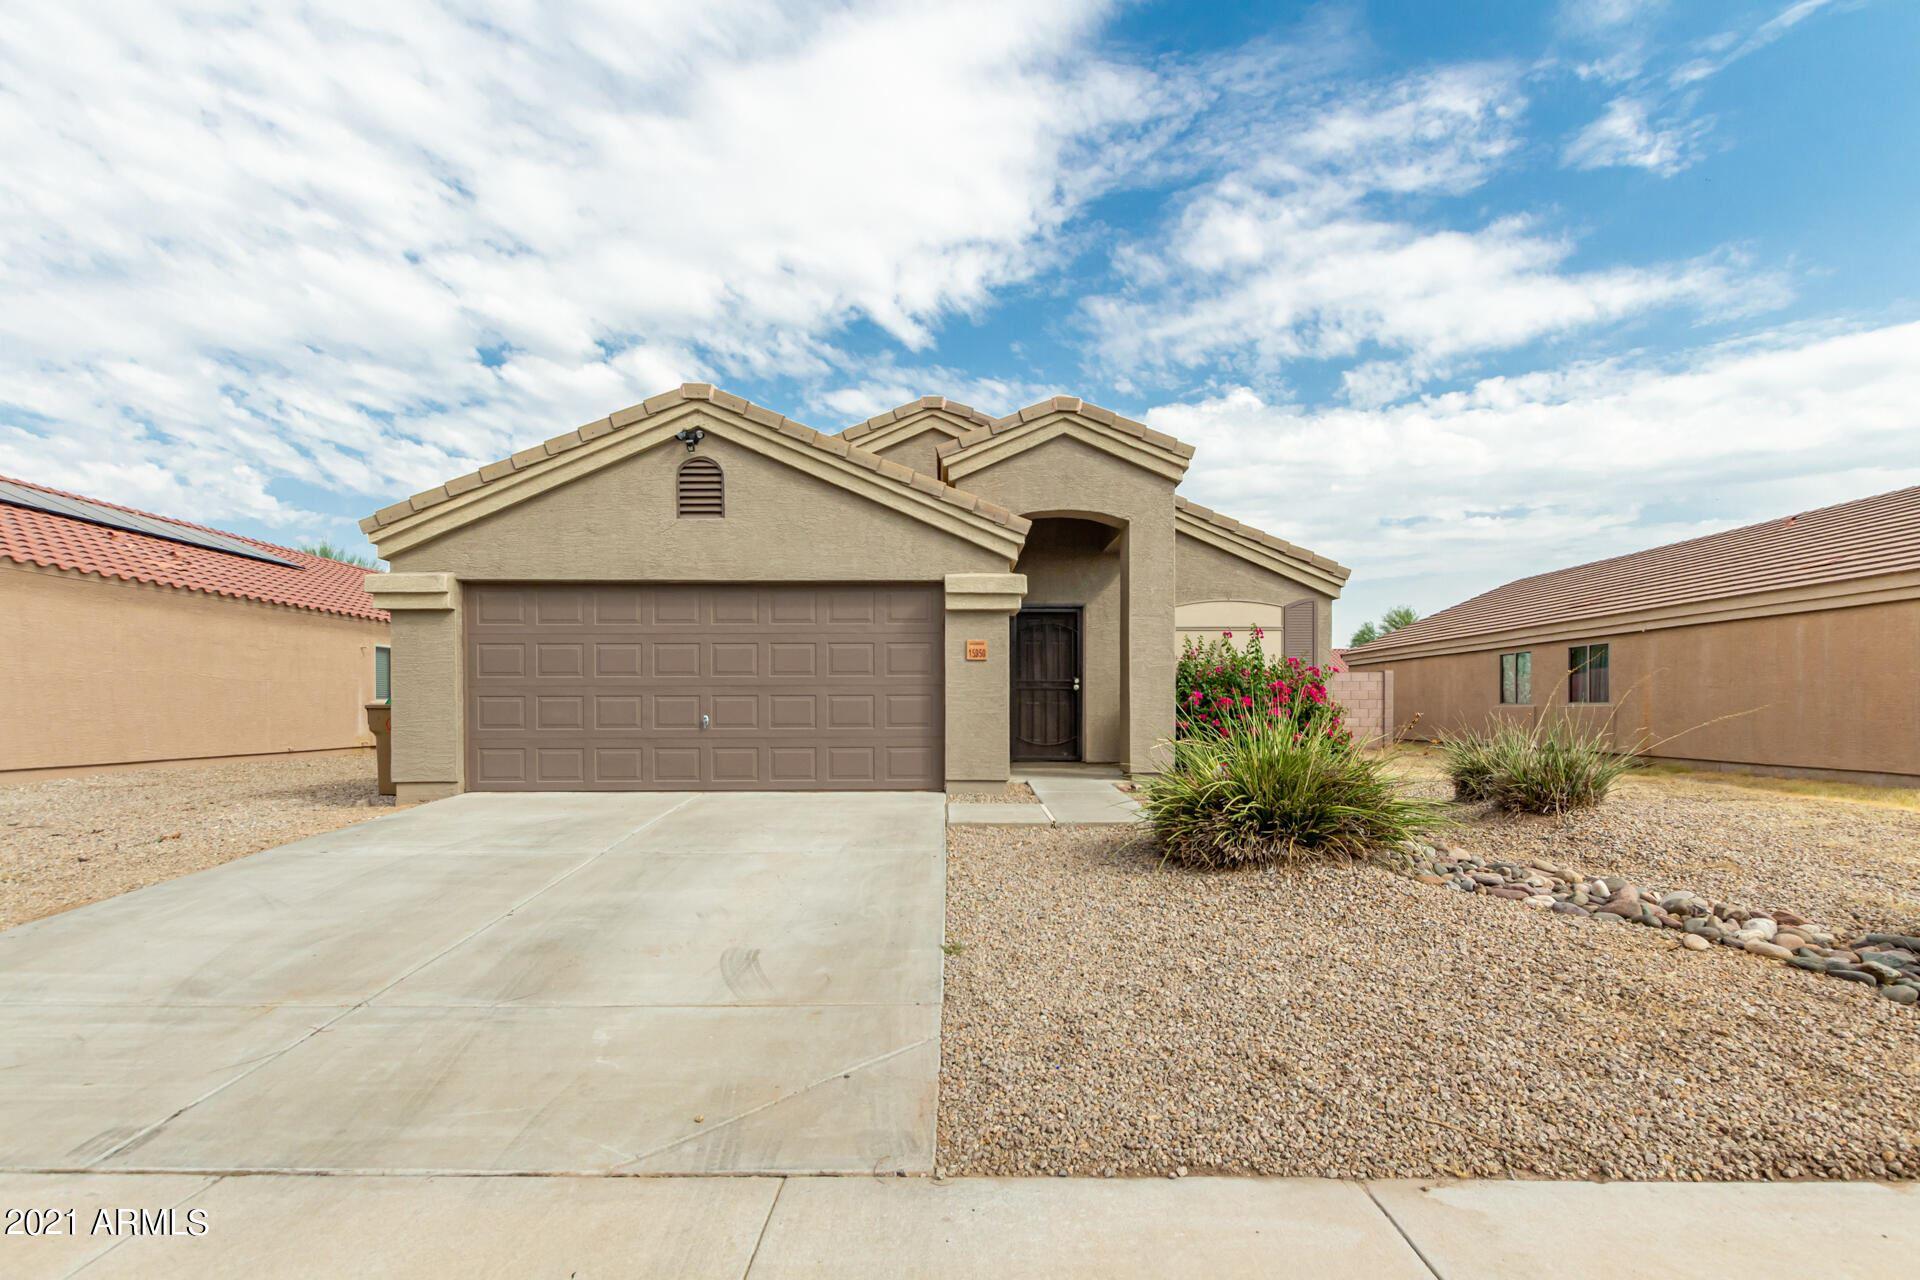 Photo of 15950 W GIBSON Lane, Goodyear, AZ 85338 (MLS # 6294033)